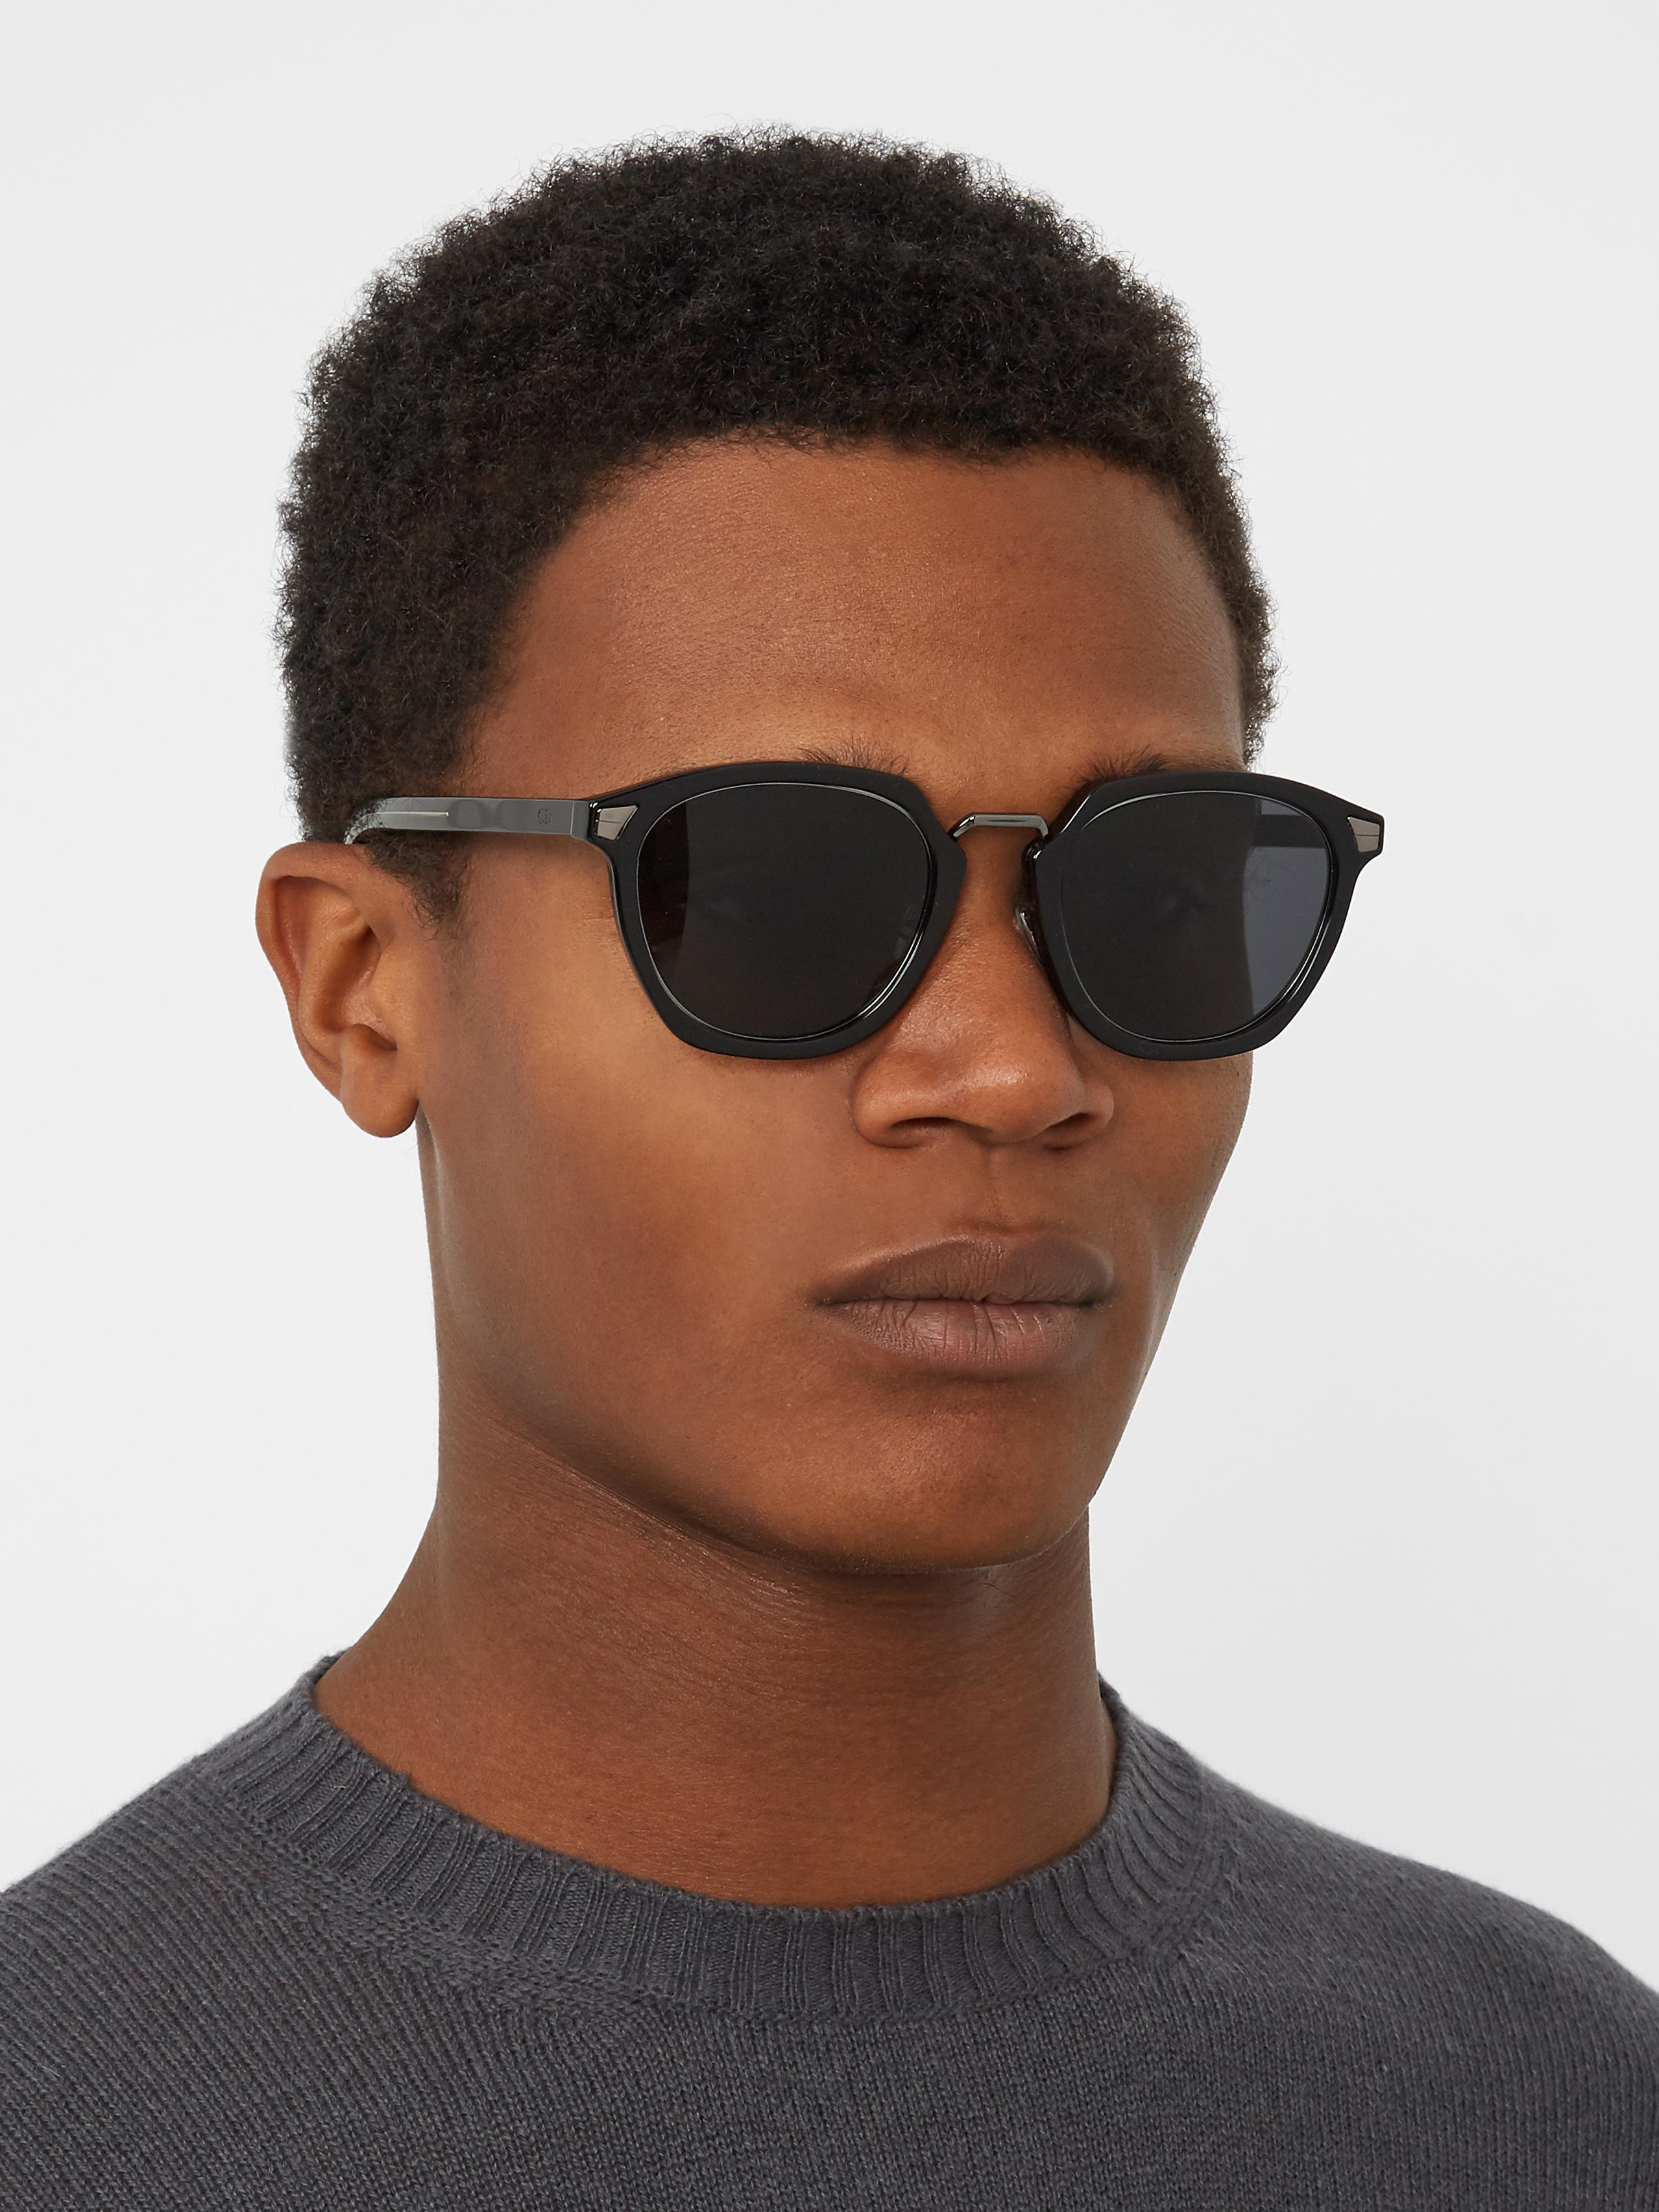 0748ba8dd1cc4 Dior Homme Tailoring 1 D-frame Sunglasses in Black for Men - Lyst